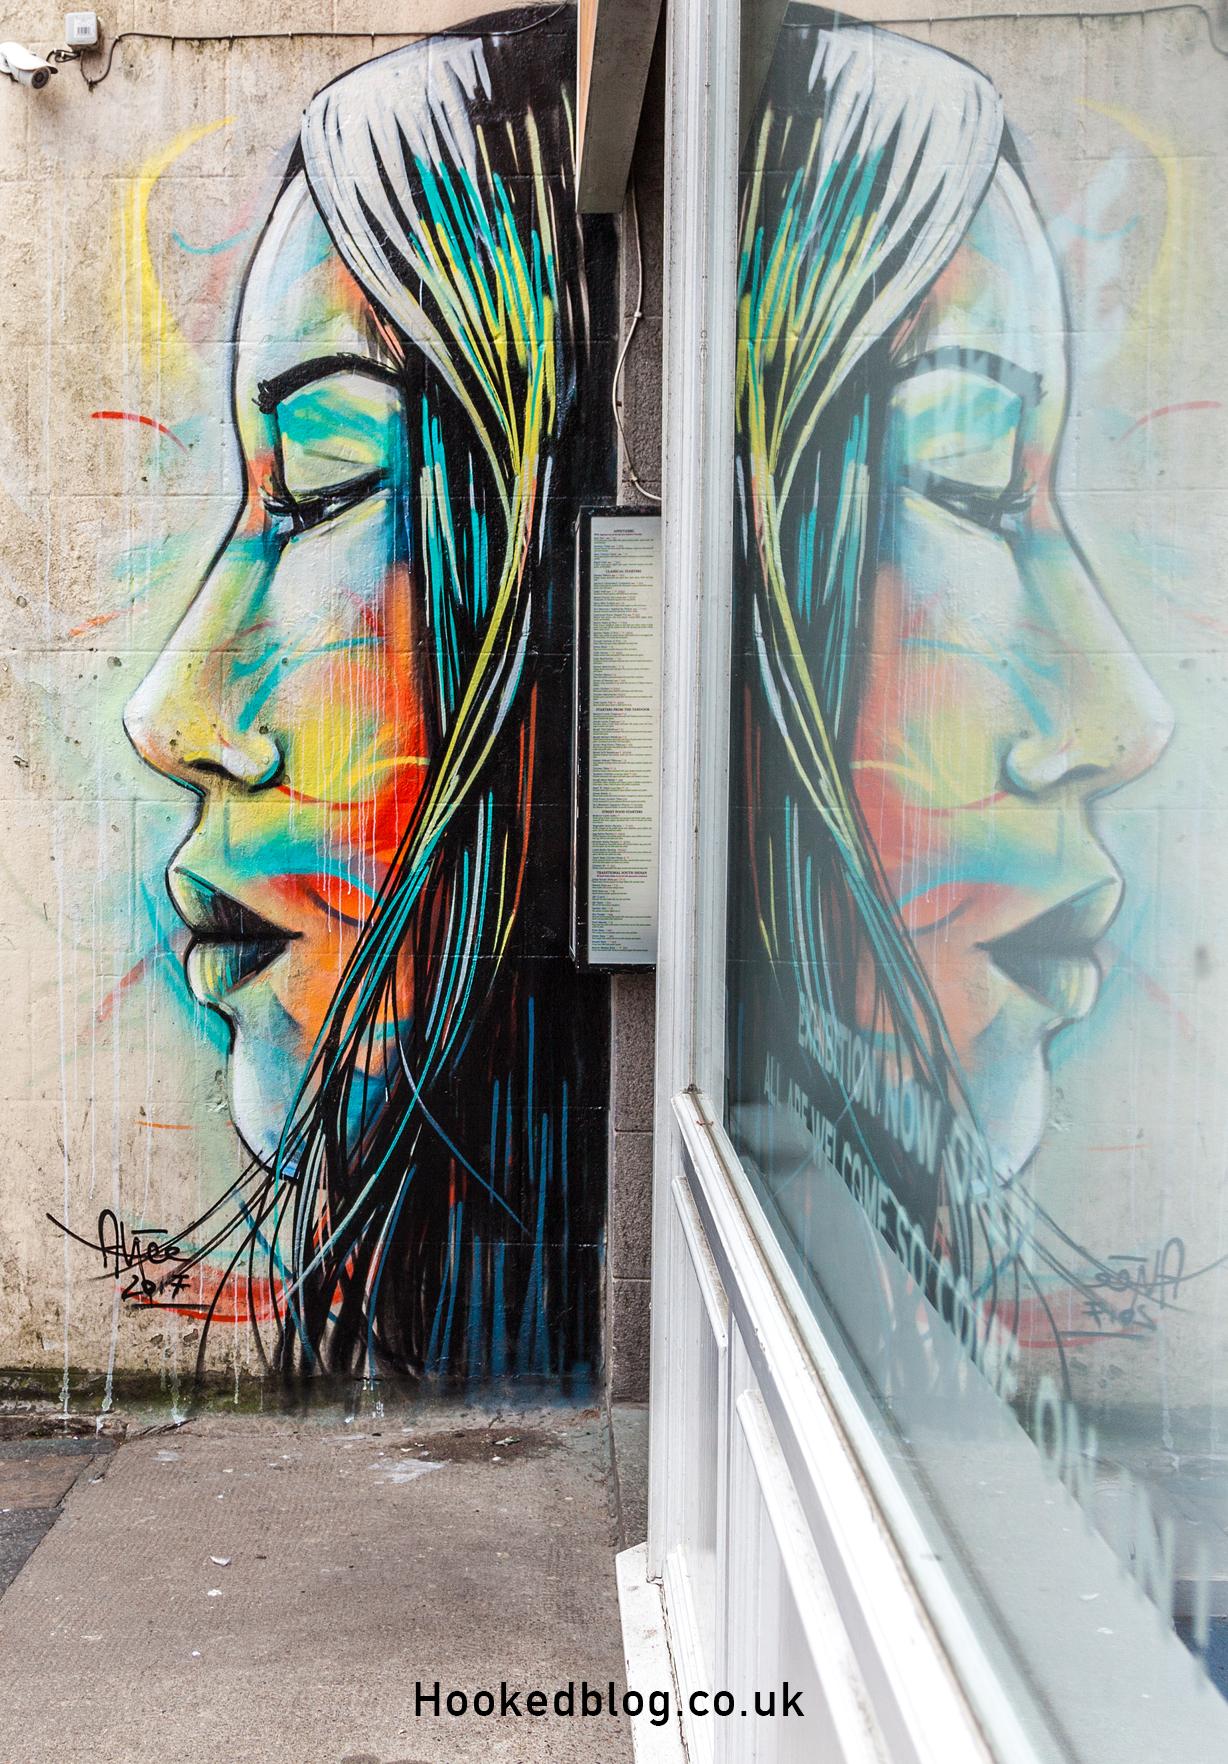 Artist Alice Pasquini at work, Aberdeen Street Art Mural in Scotland. Photo ©Hookedblog /  Mark Rigney